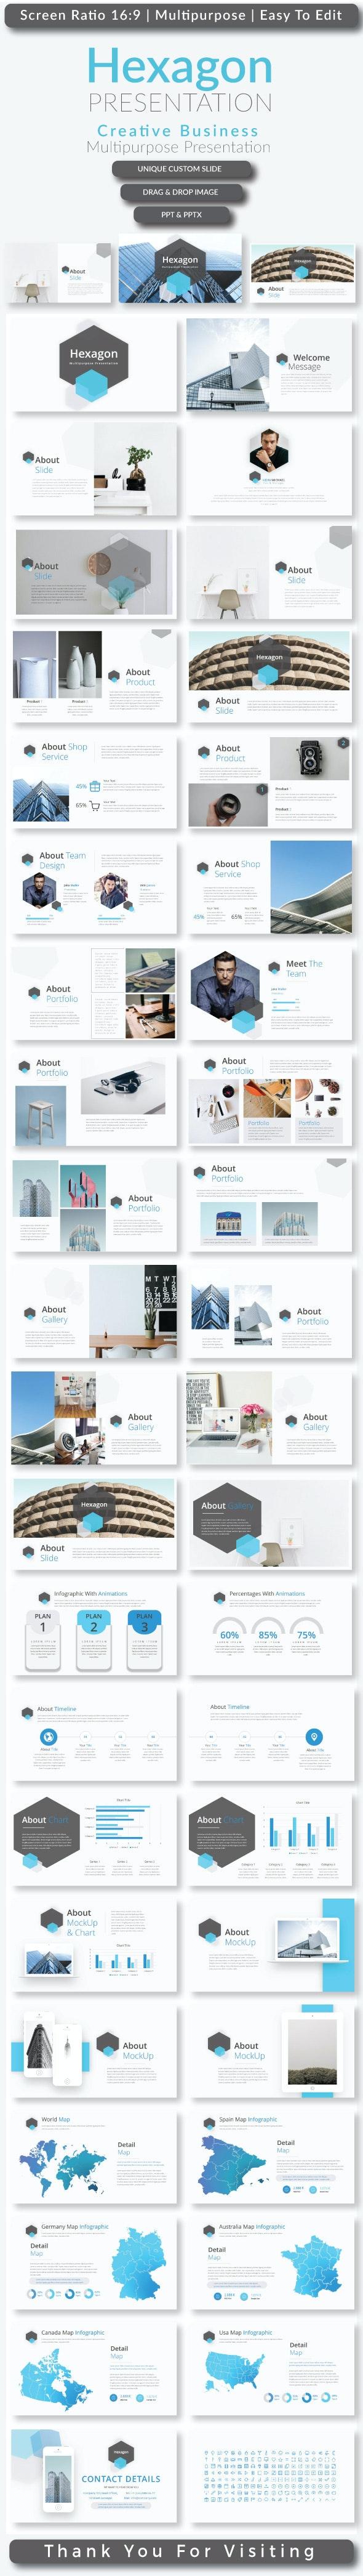 Hexagon Presentation Templates - Creative PowerPoint Templates